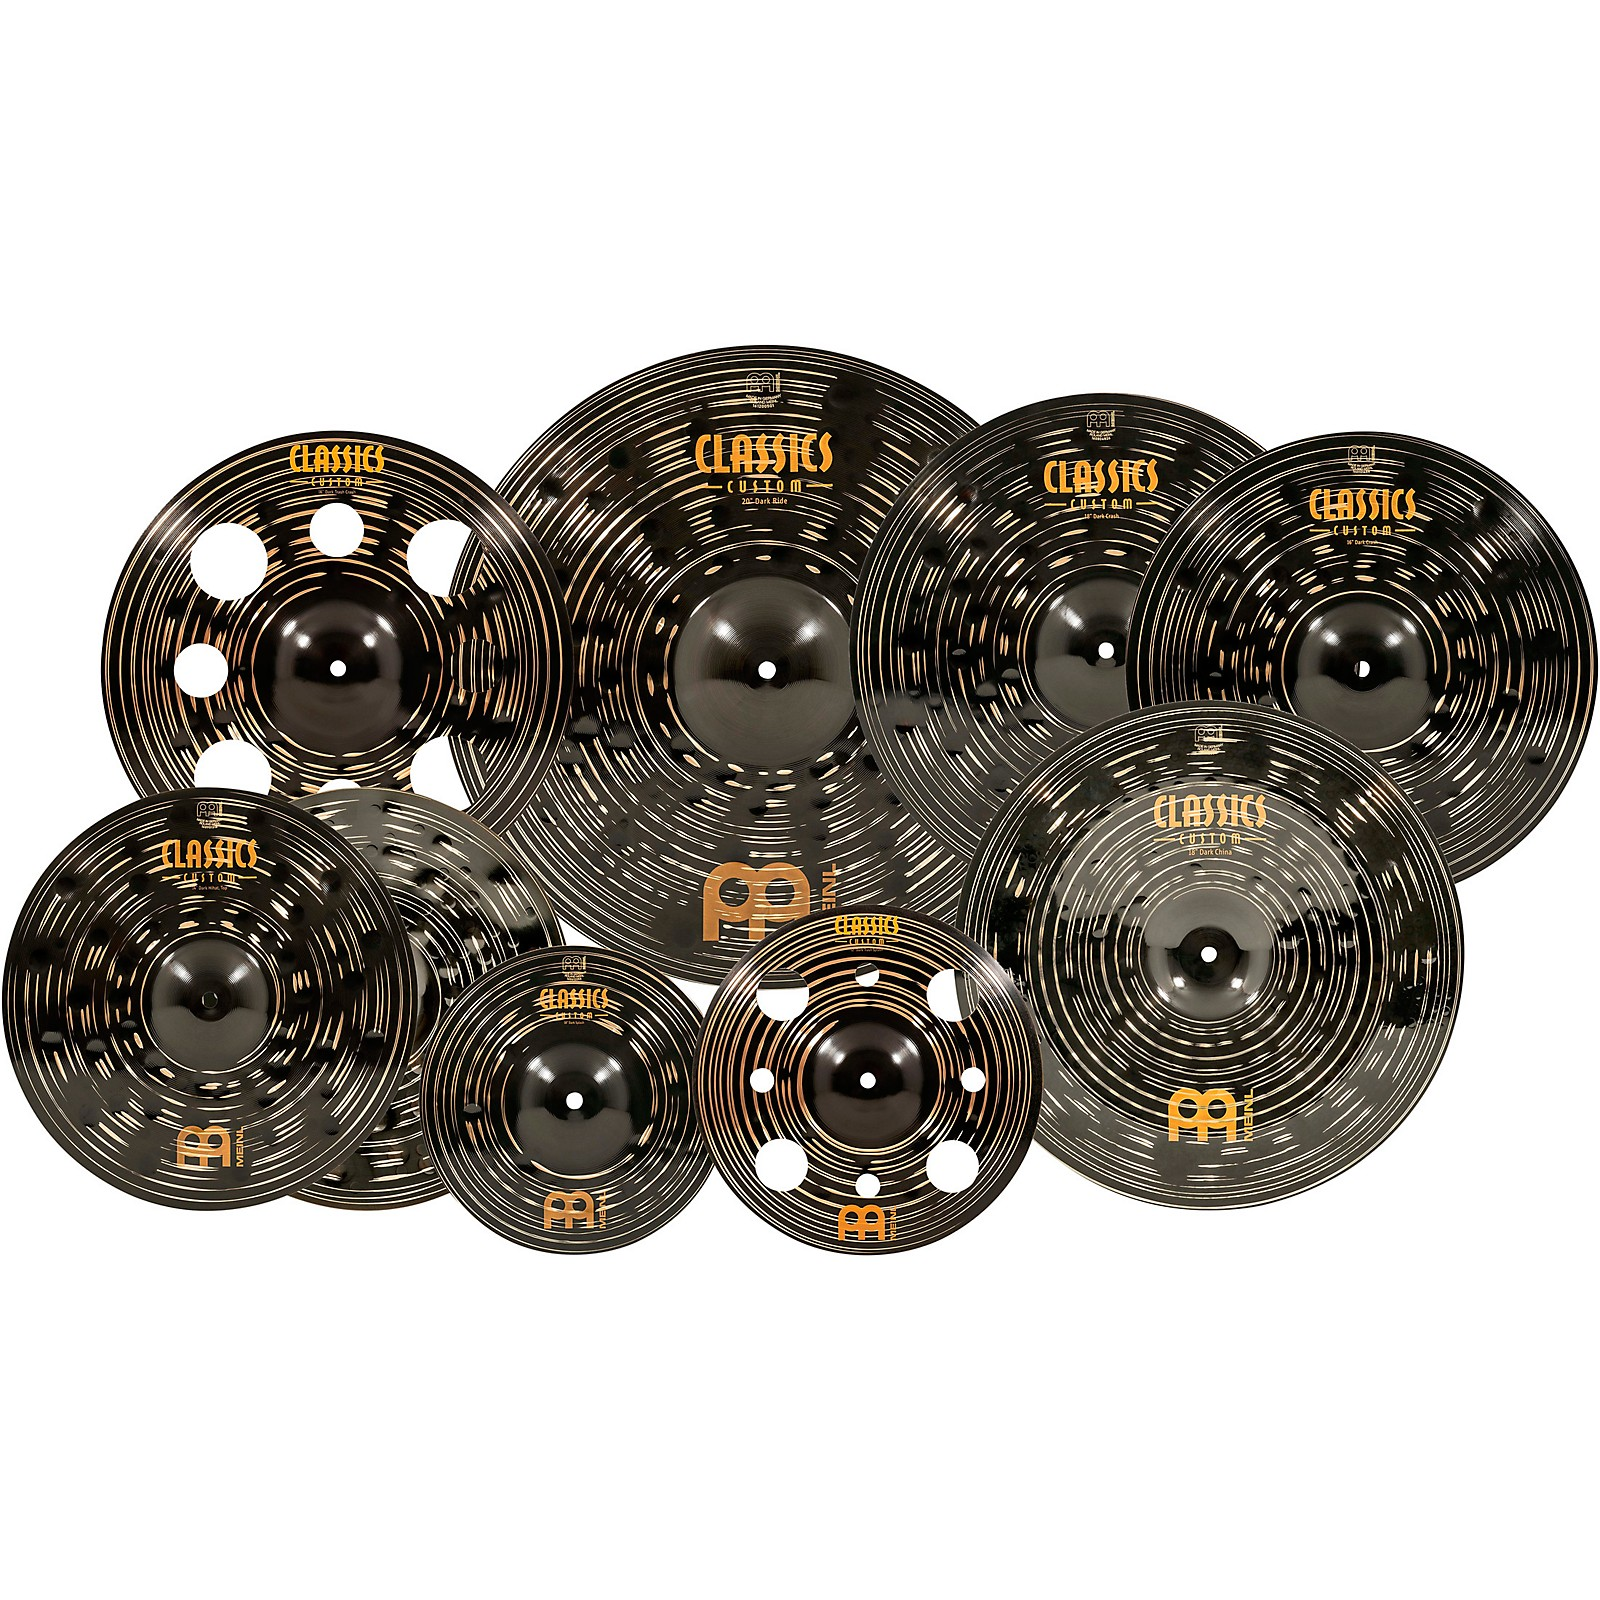 Meinl Classics Custom Dark Expanded Cymbal Set